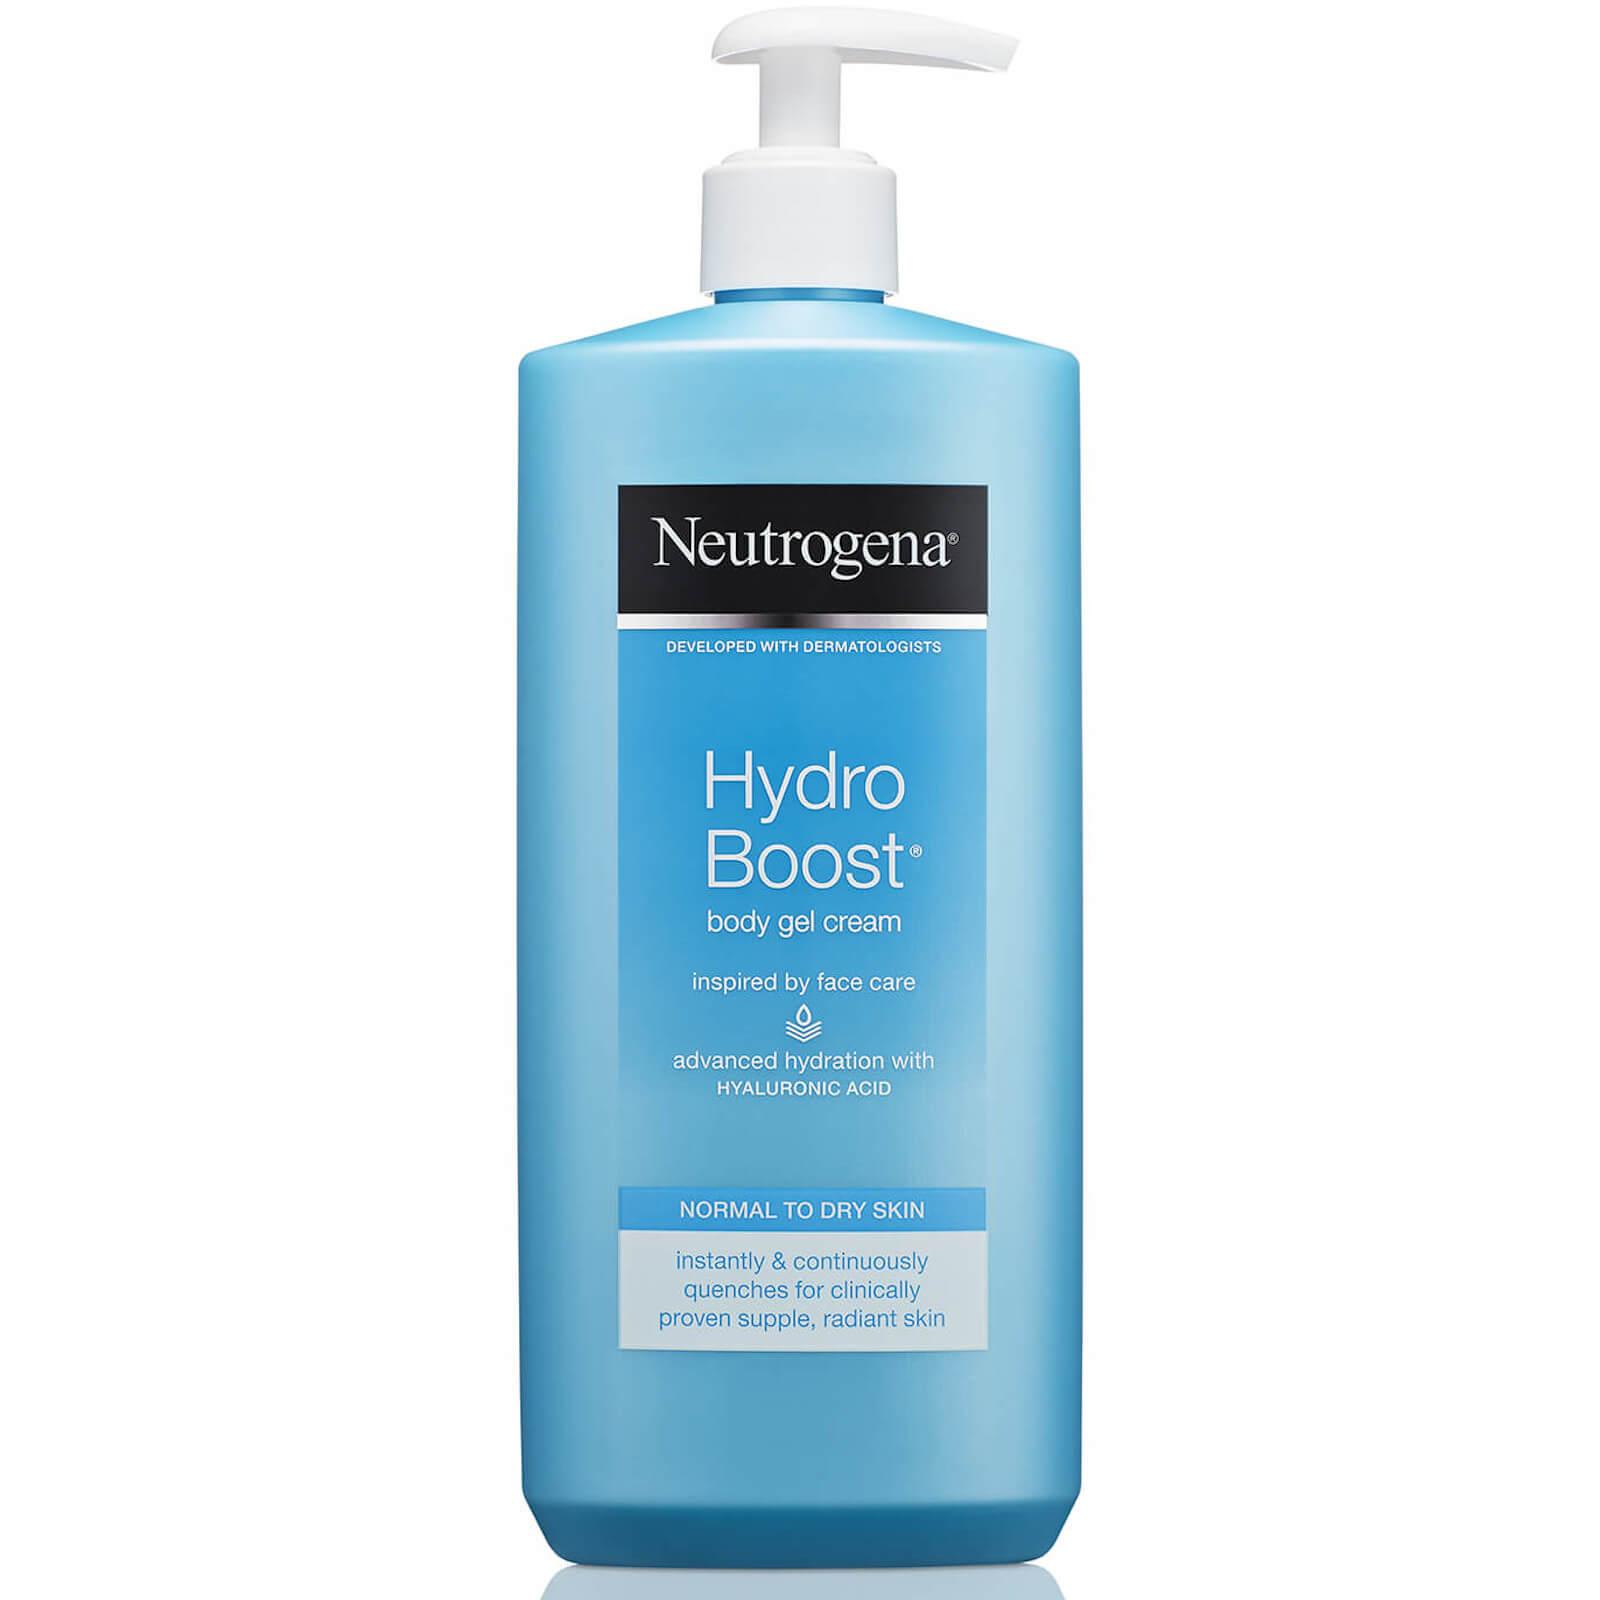 Neutrogena Hydro Boost Body Gel Cream Moisturiser for Normal to Dry Skin 400ml